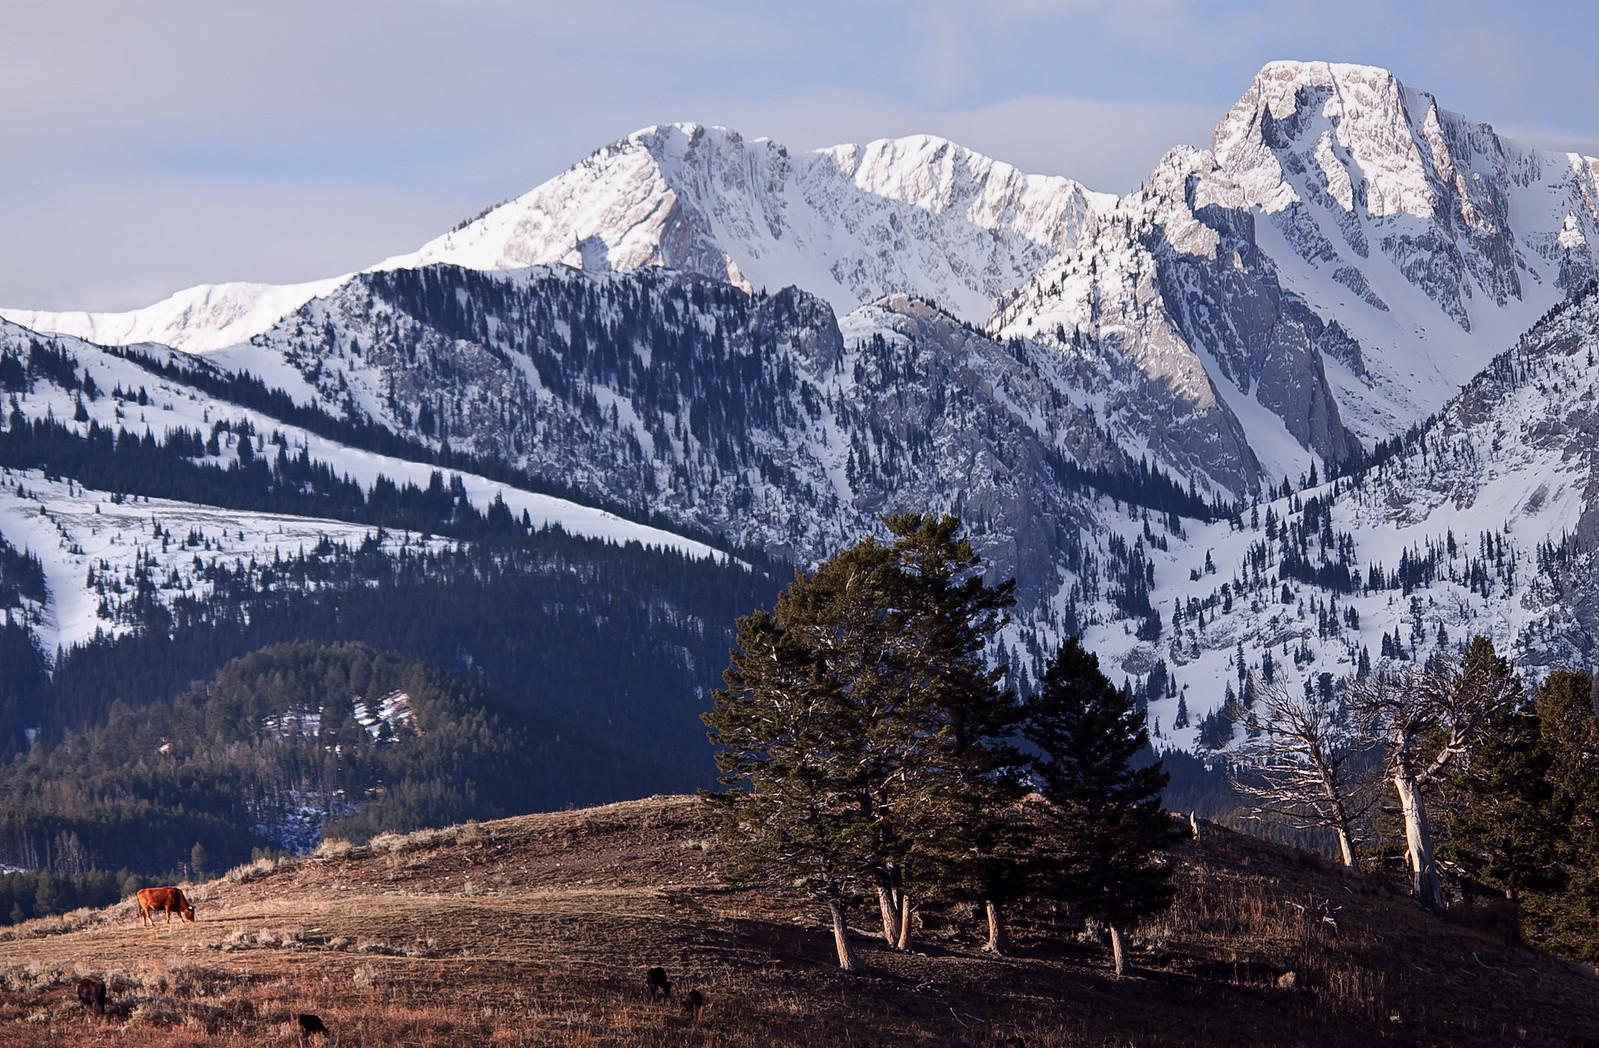 Montana is beautiful. [pic]